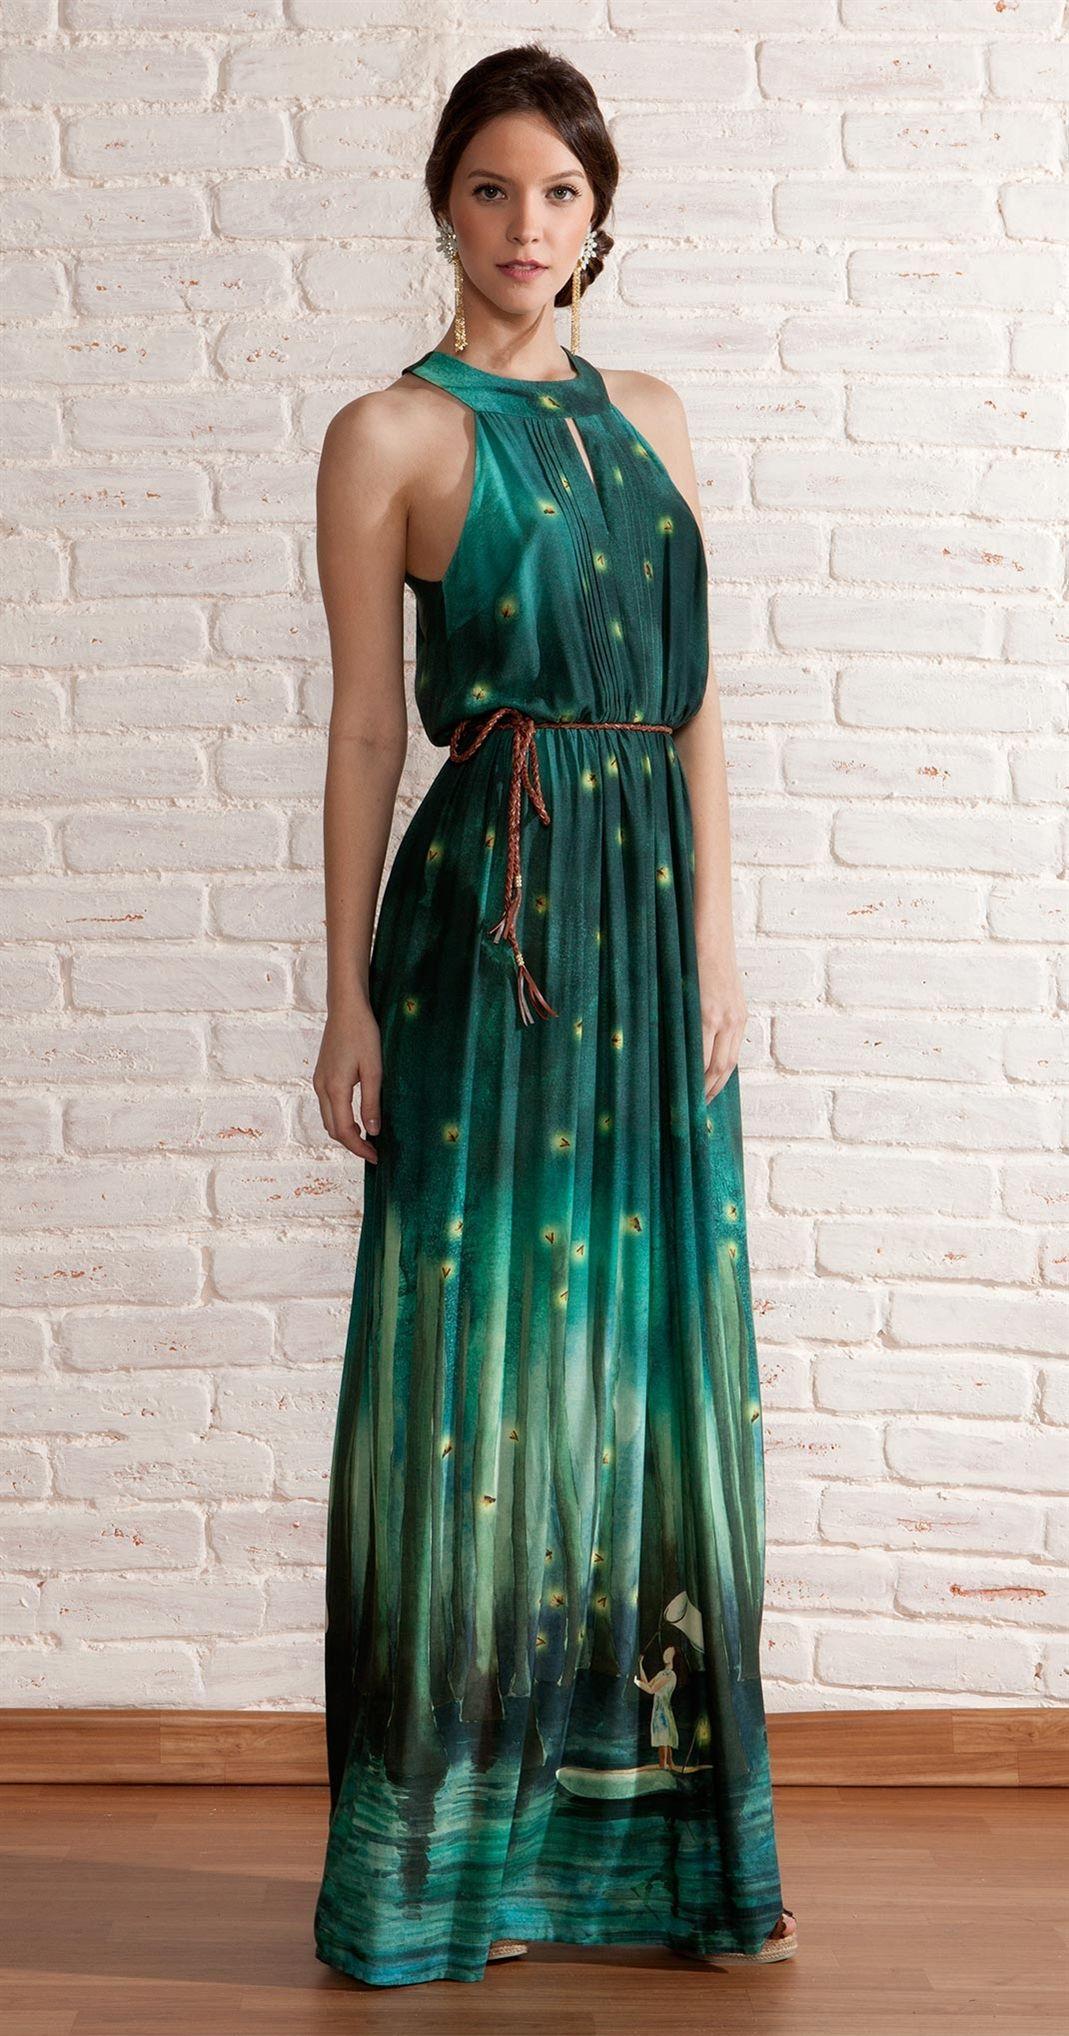 Green dress prom  Vestido Longo Caçador de Vagalume  Roupas  Pinterest  Orange grey